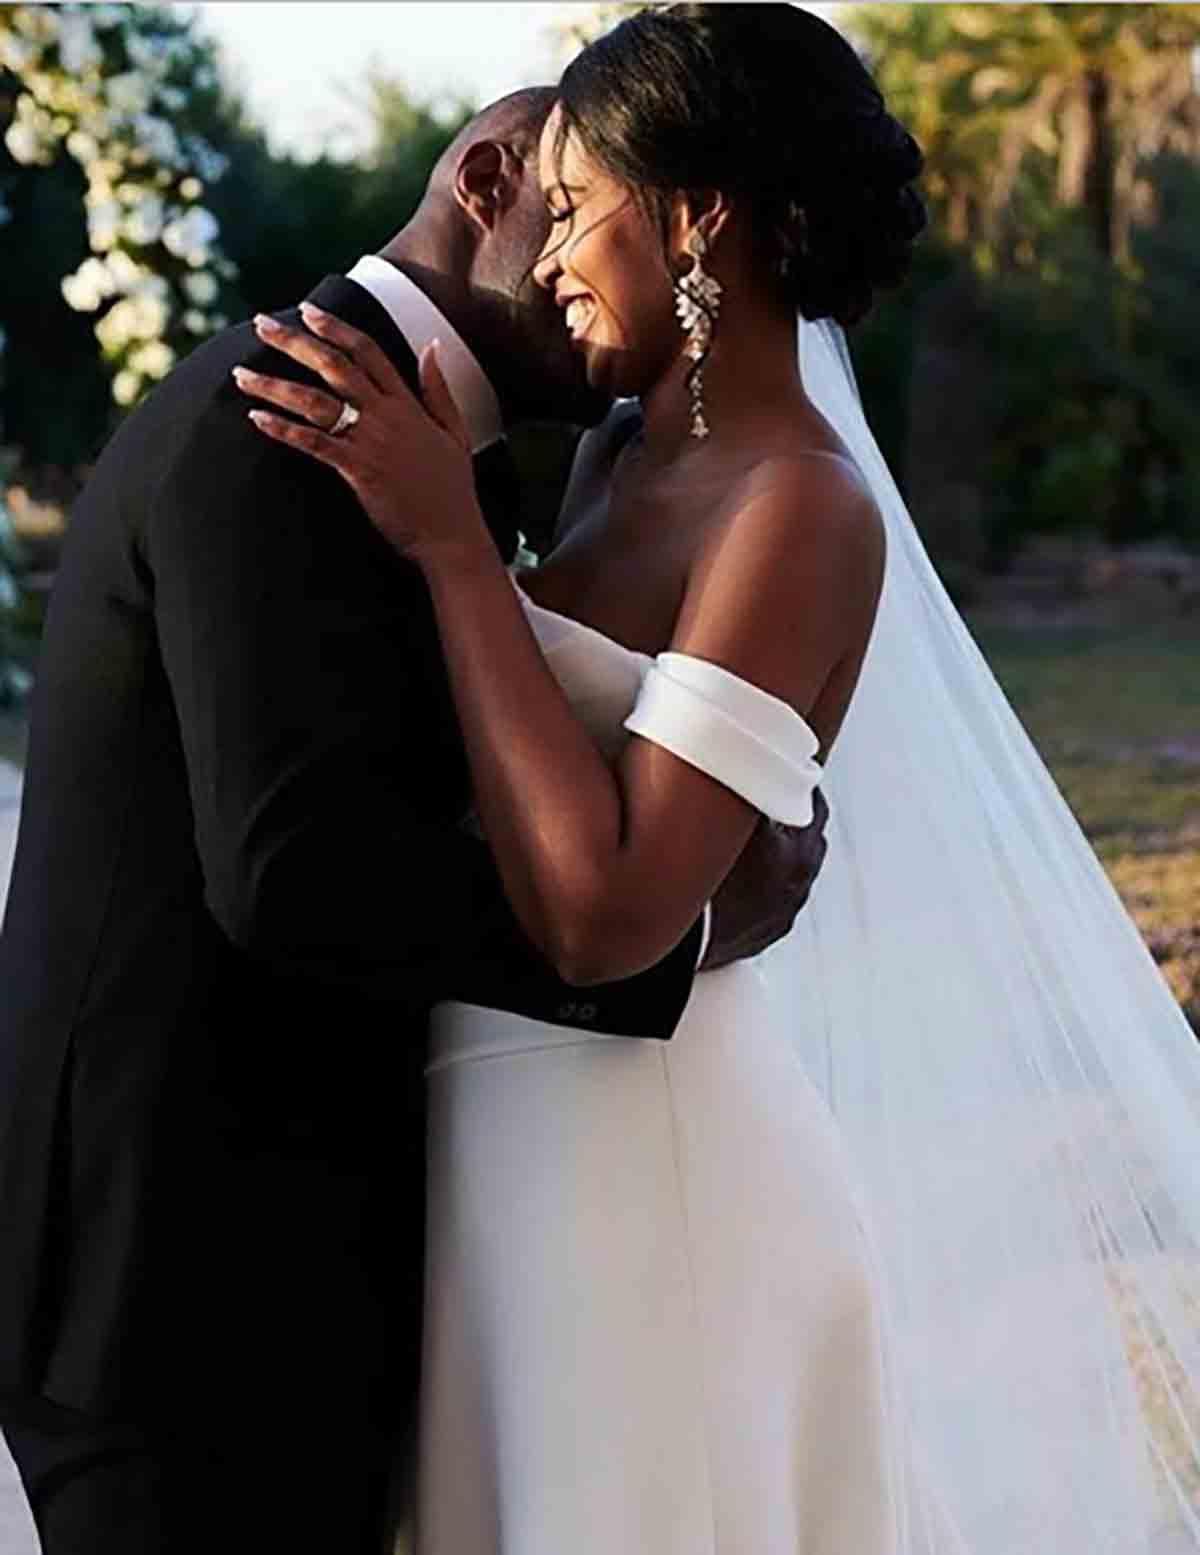 Idris-&-Sabrina-wedding-resized